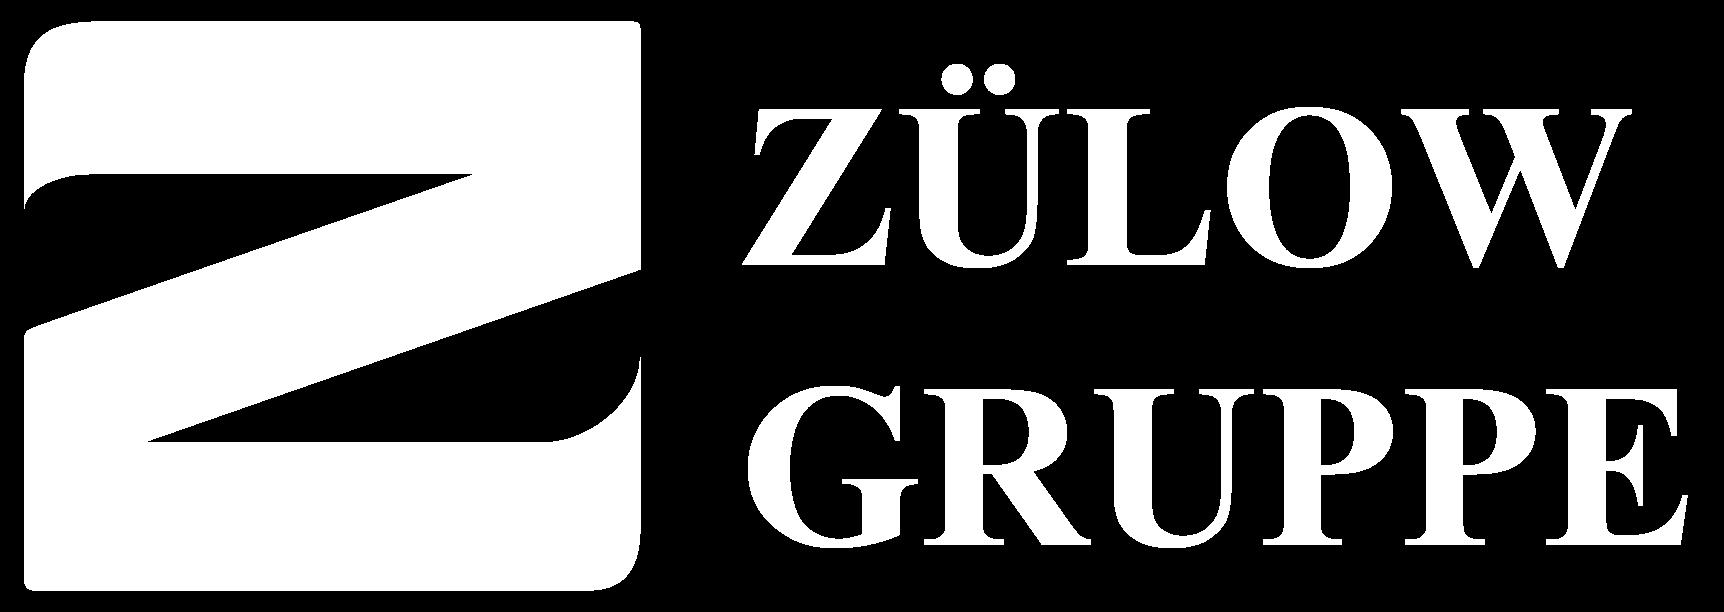 ZÜLOW GRUPPE